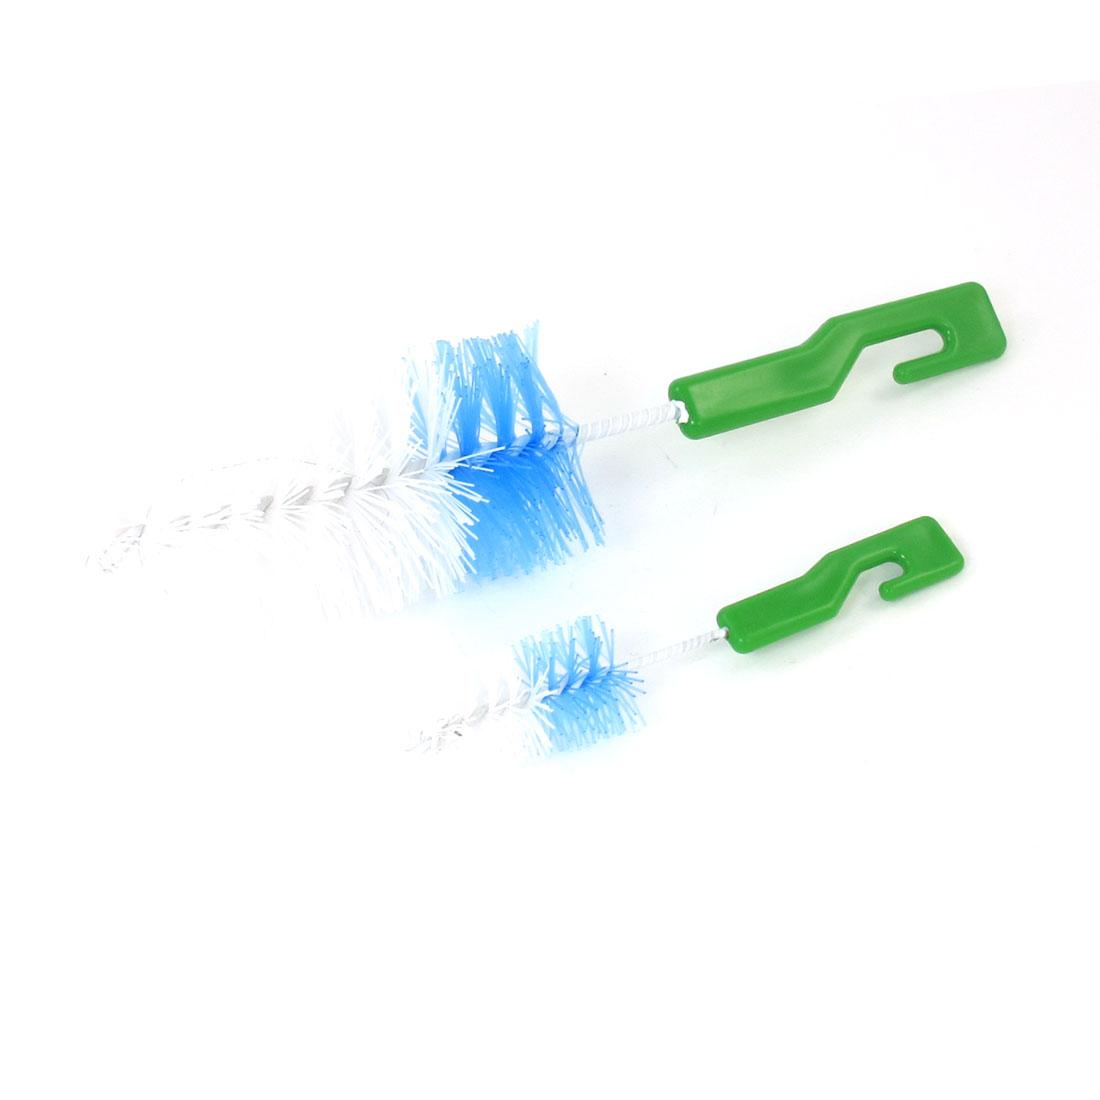 Hanging Hook Design Plastic Handle Milk Bottle Nipple Cleaning Brush 2pcs